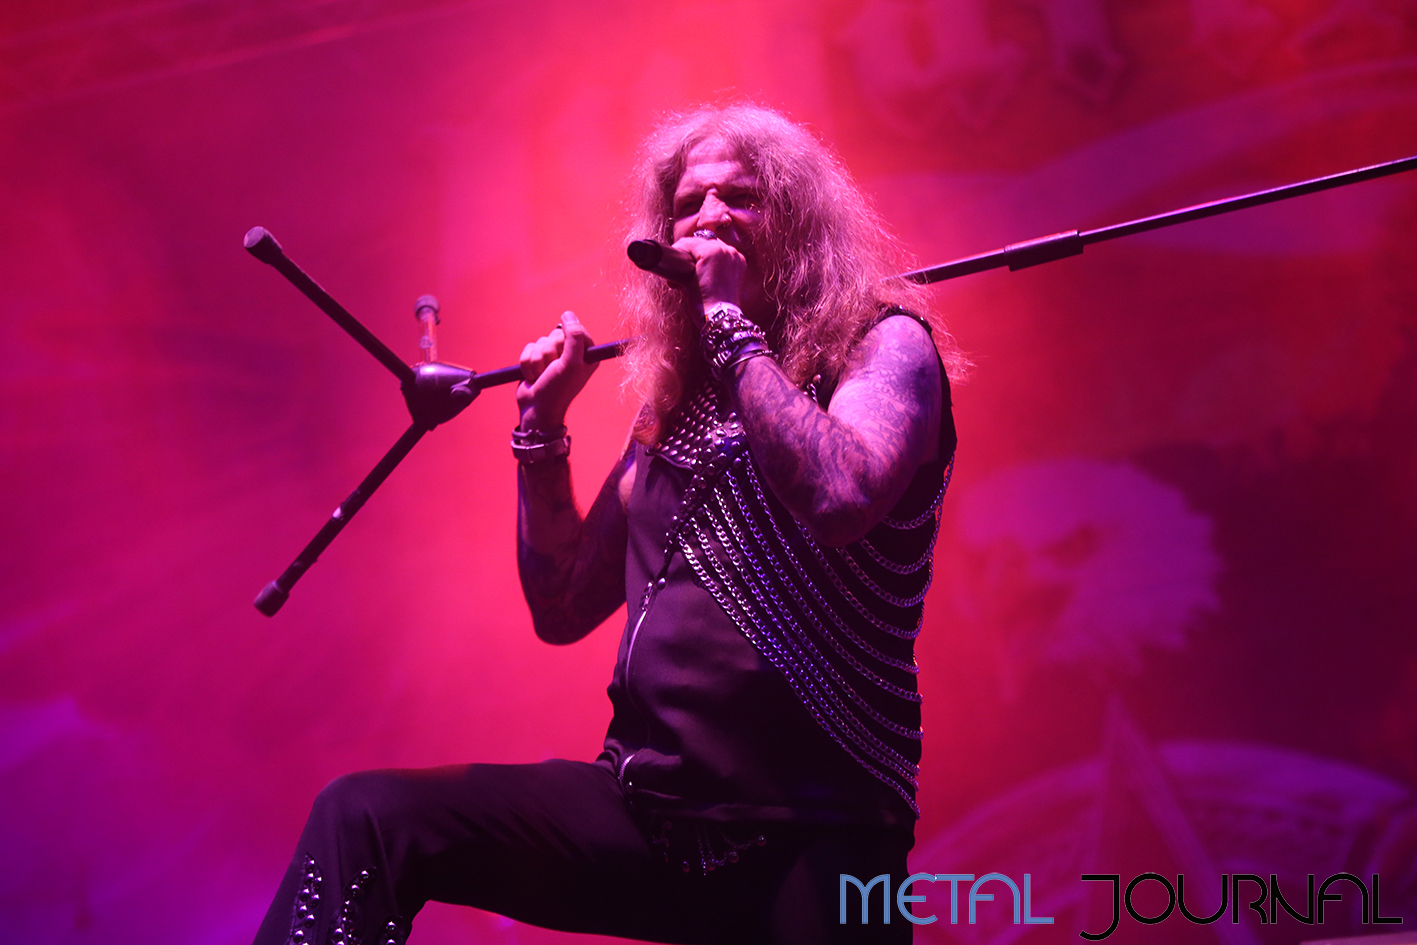 lujuria - leyendas del rock 2019 metal journal pic 1